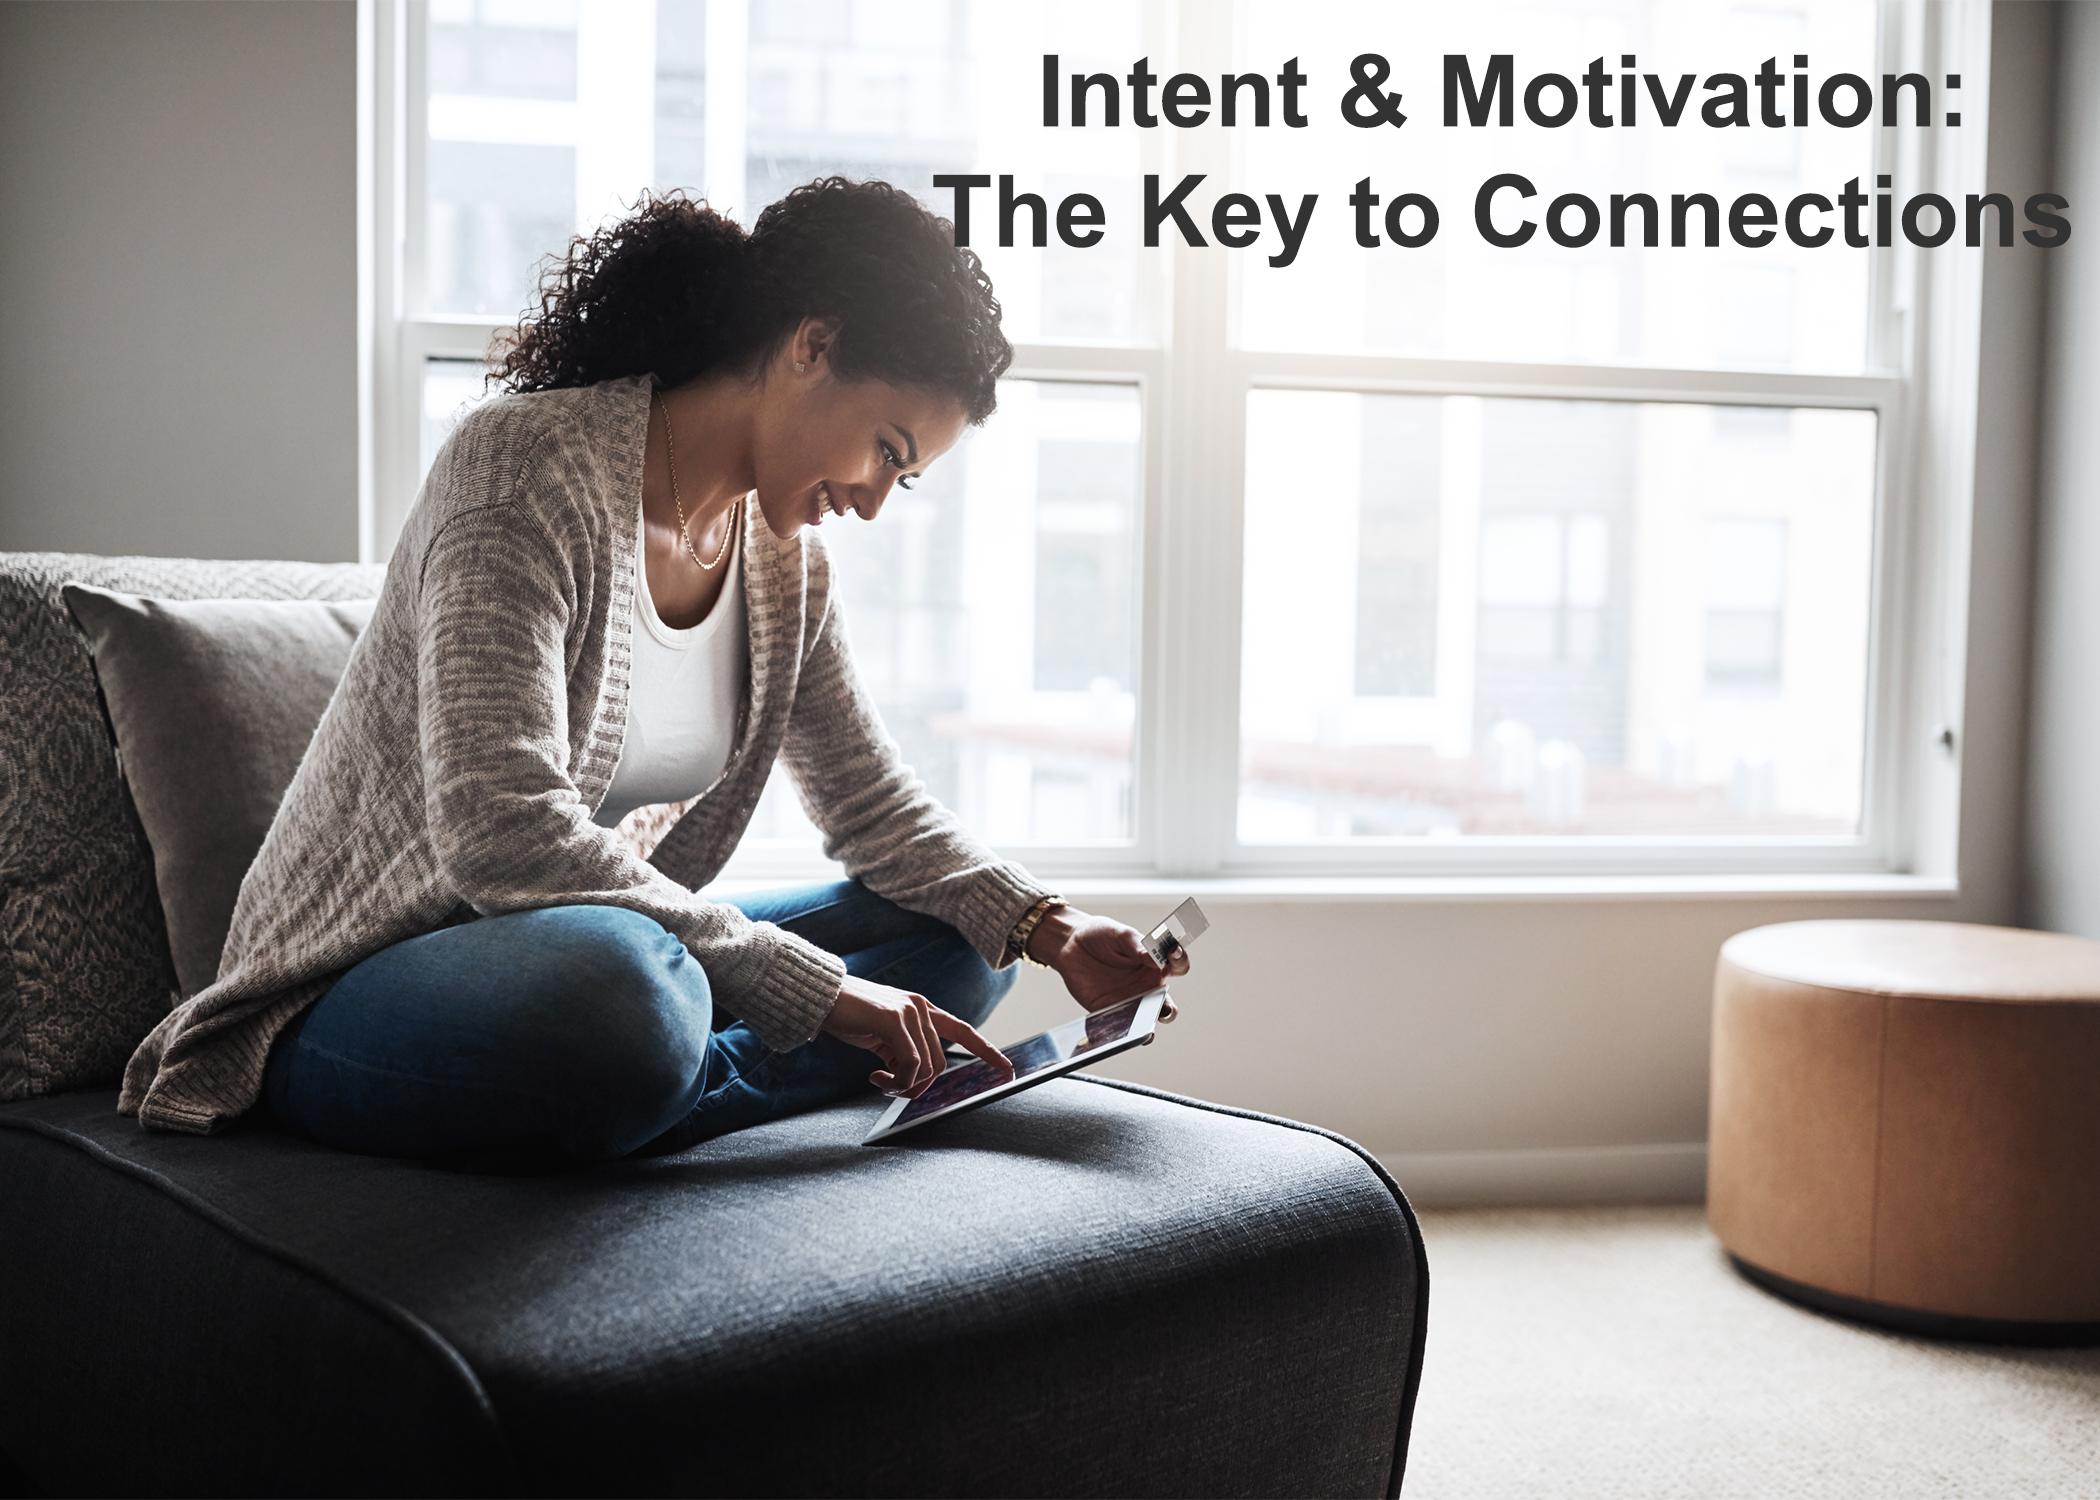 Intent & Motivation